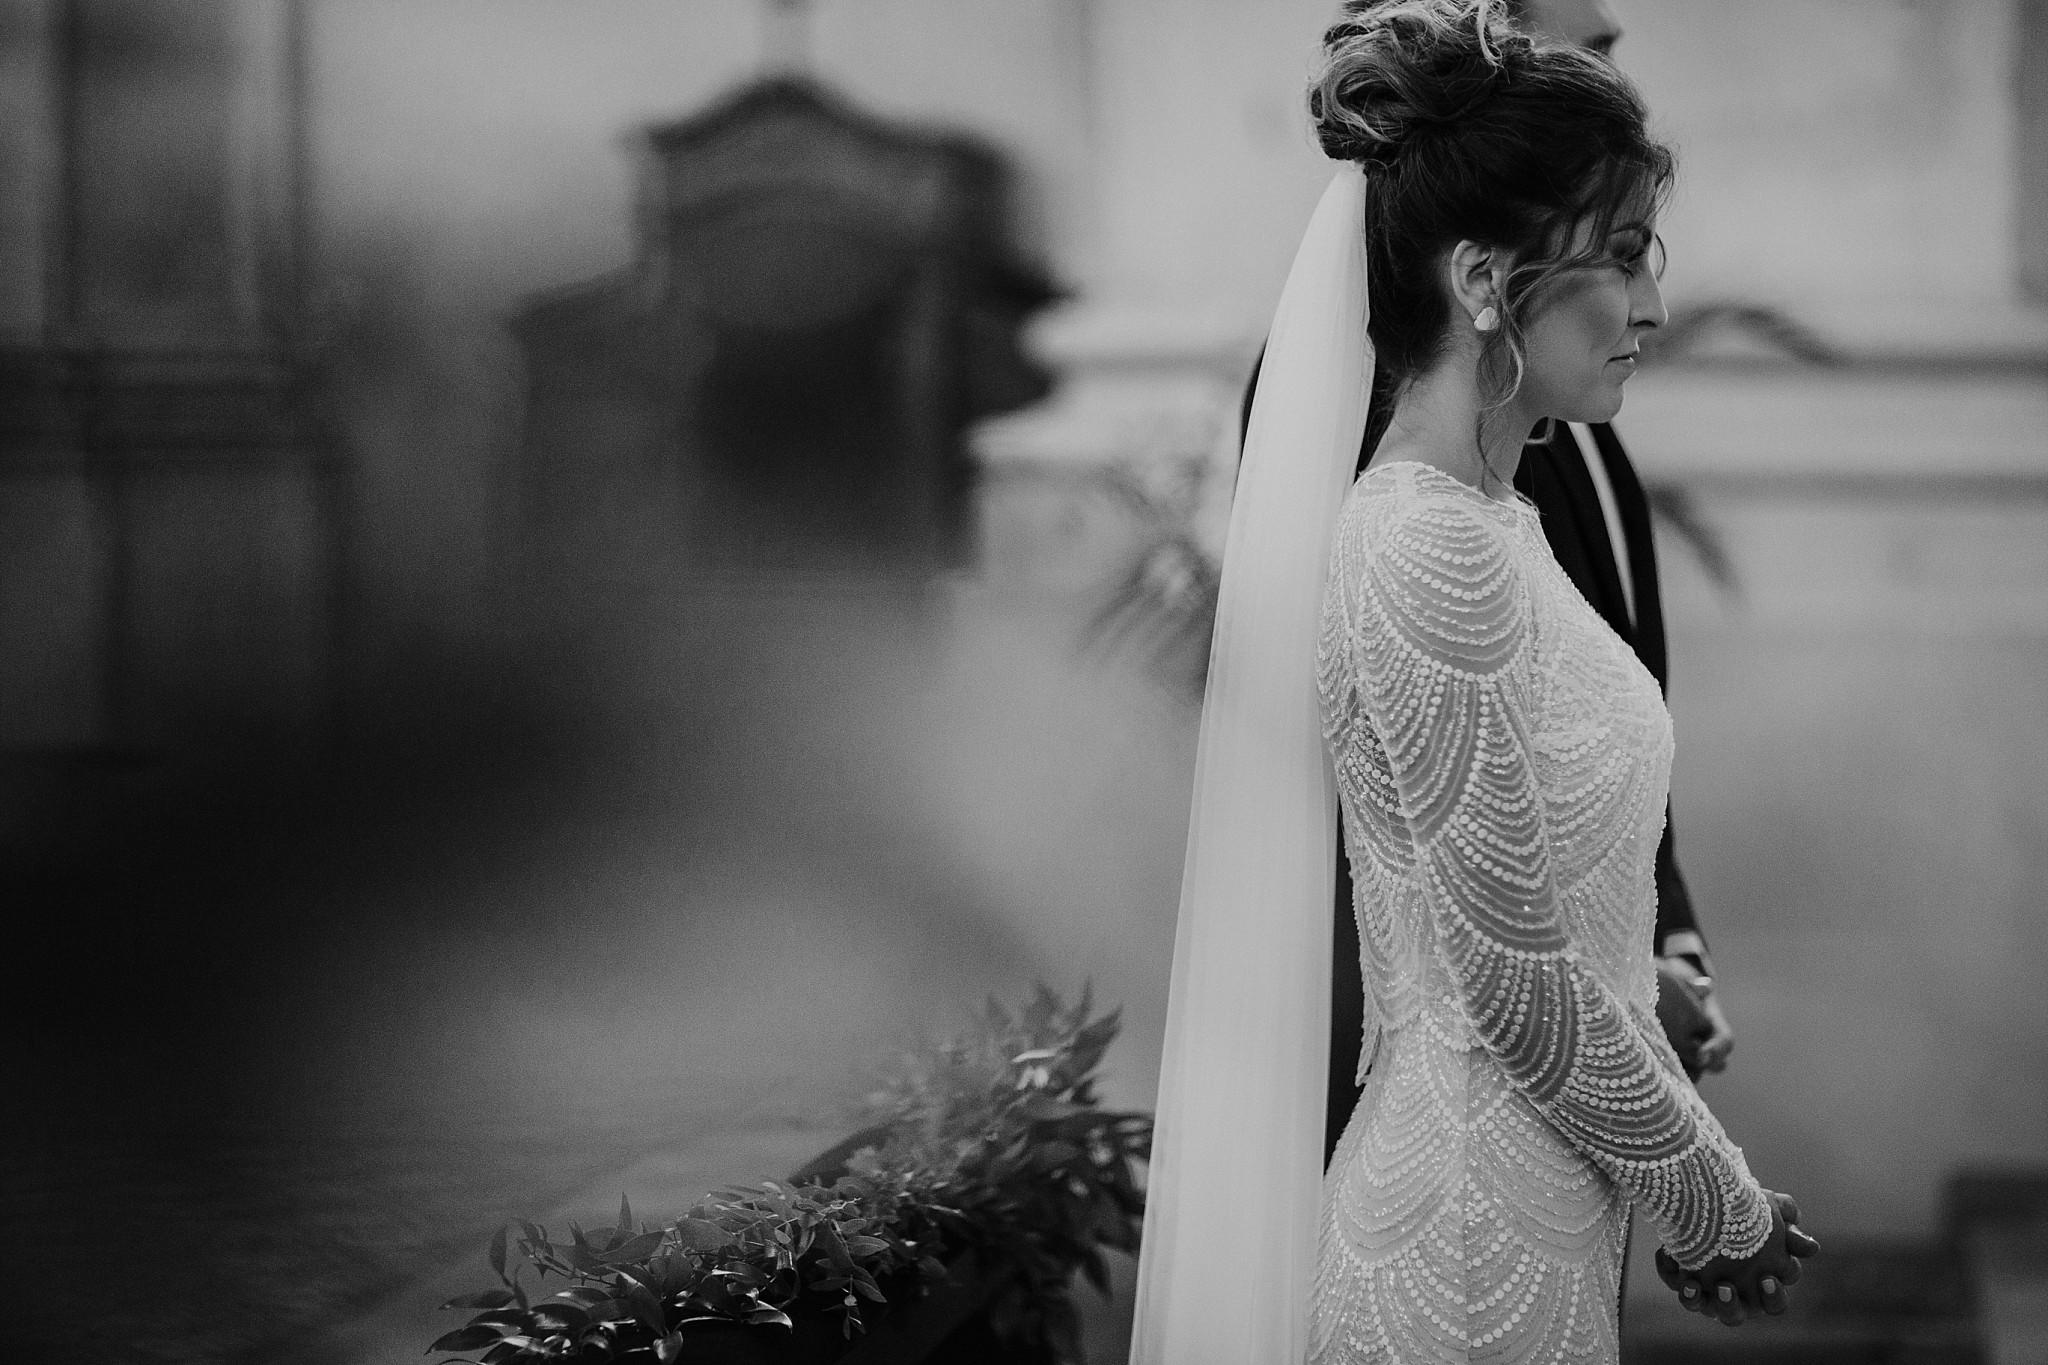 fotograf poznan wesele dobra truskawka piekne wesele pod poznaniem wesele w dobrej truskawce piekna para mloda slub marzen slub koronawirus slub listopad wesele koronawirus 167